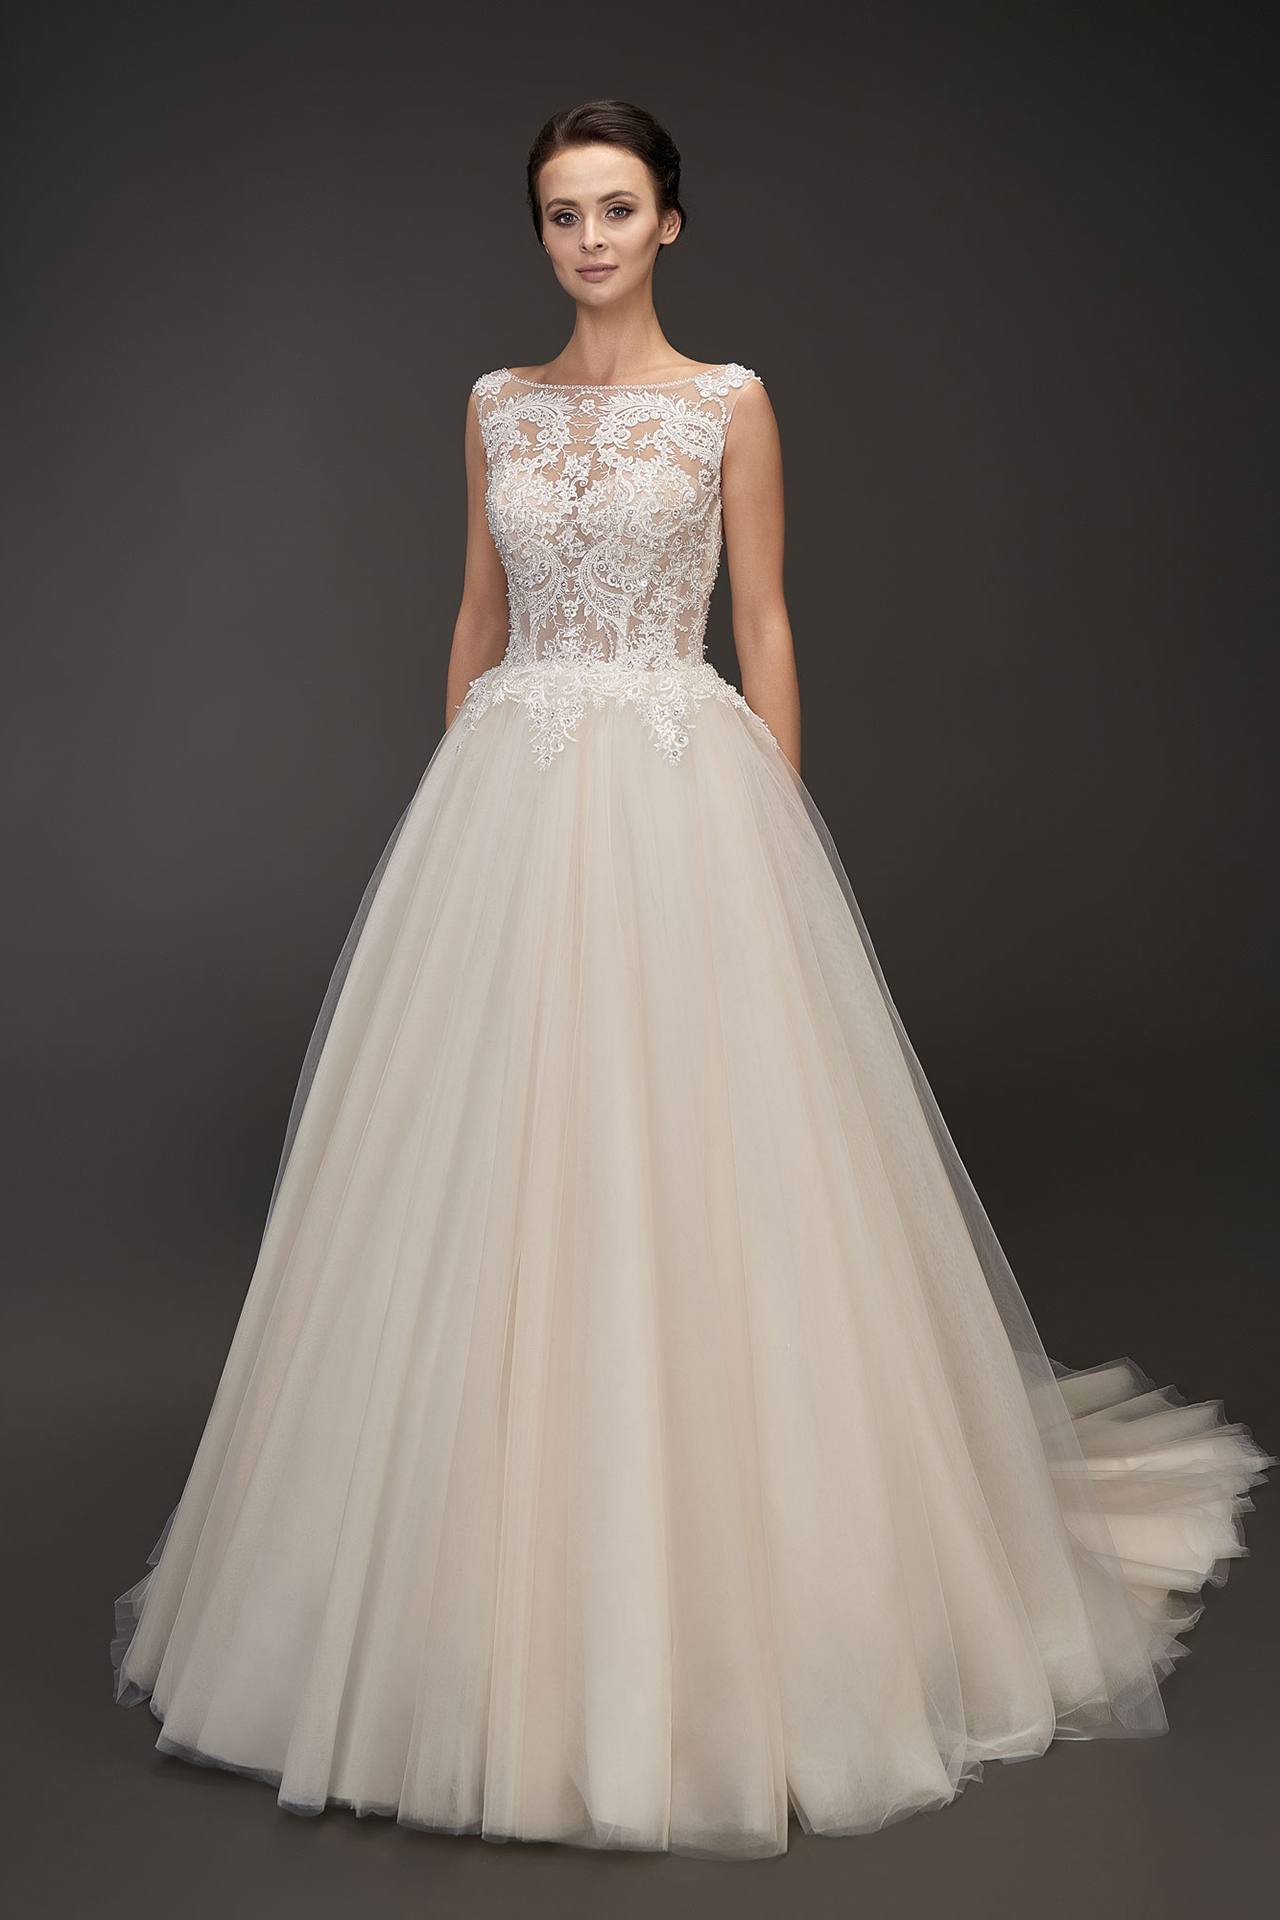 Buy Online Wedding Dress Rose Princess Ball Gown Sweetheart